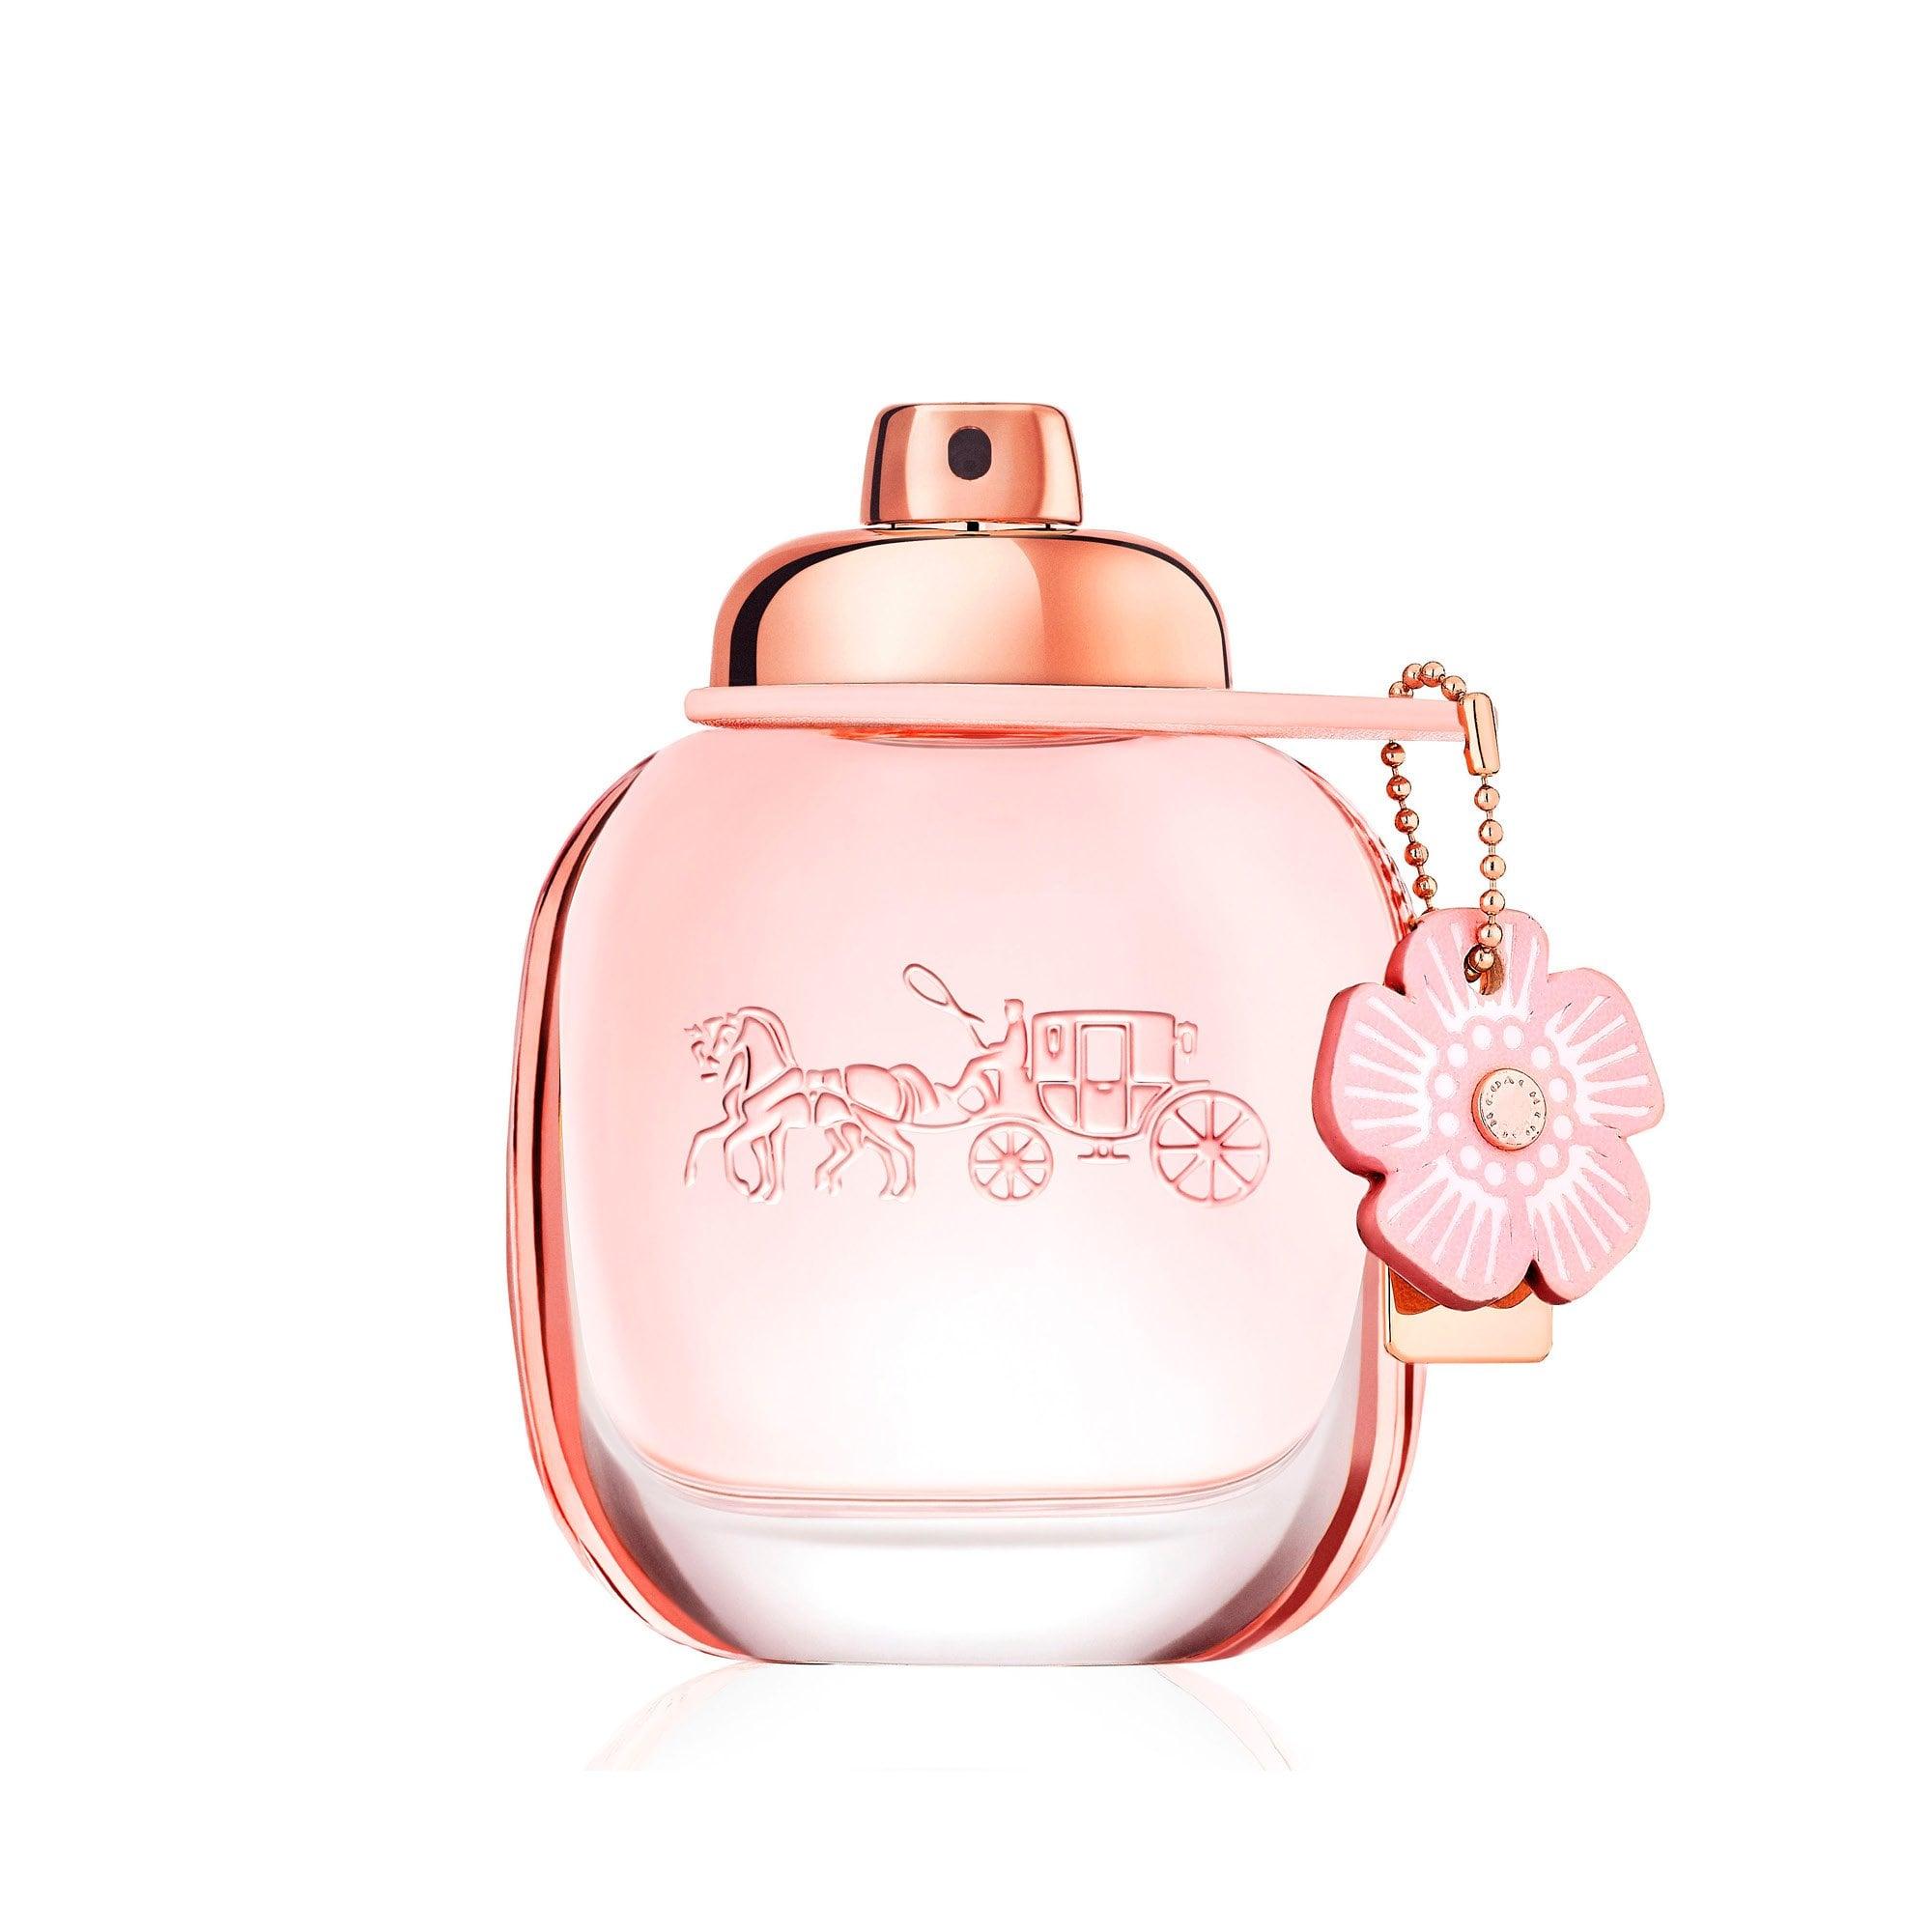 Parfum Eau 50ml Floral De OkXNn0P8w